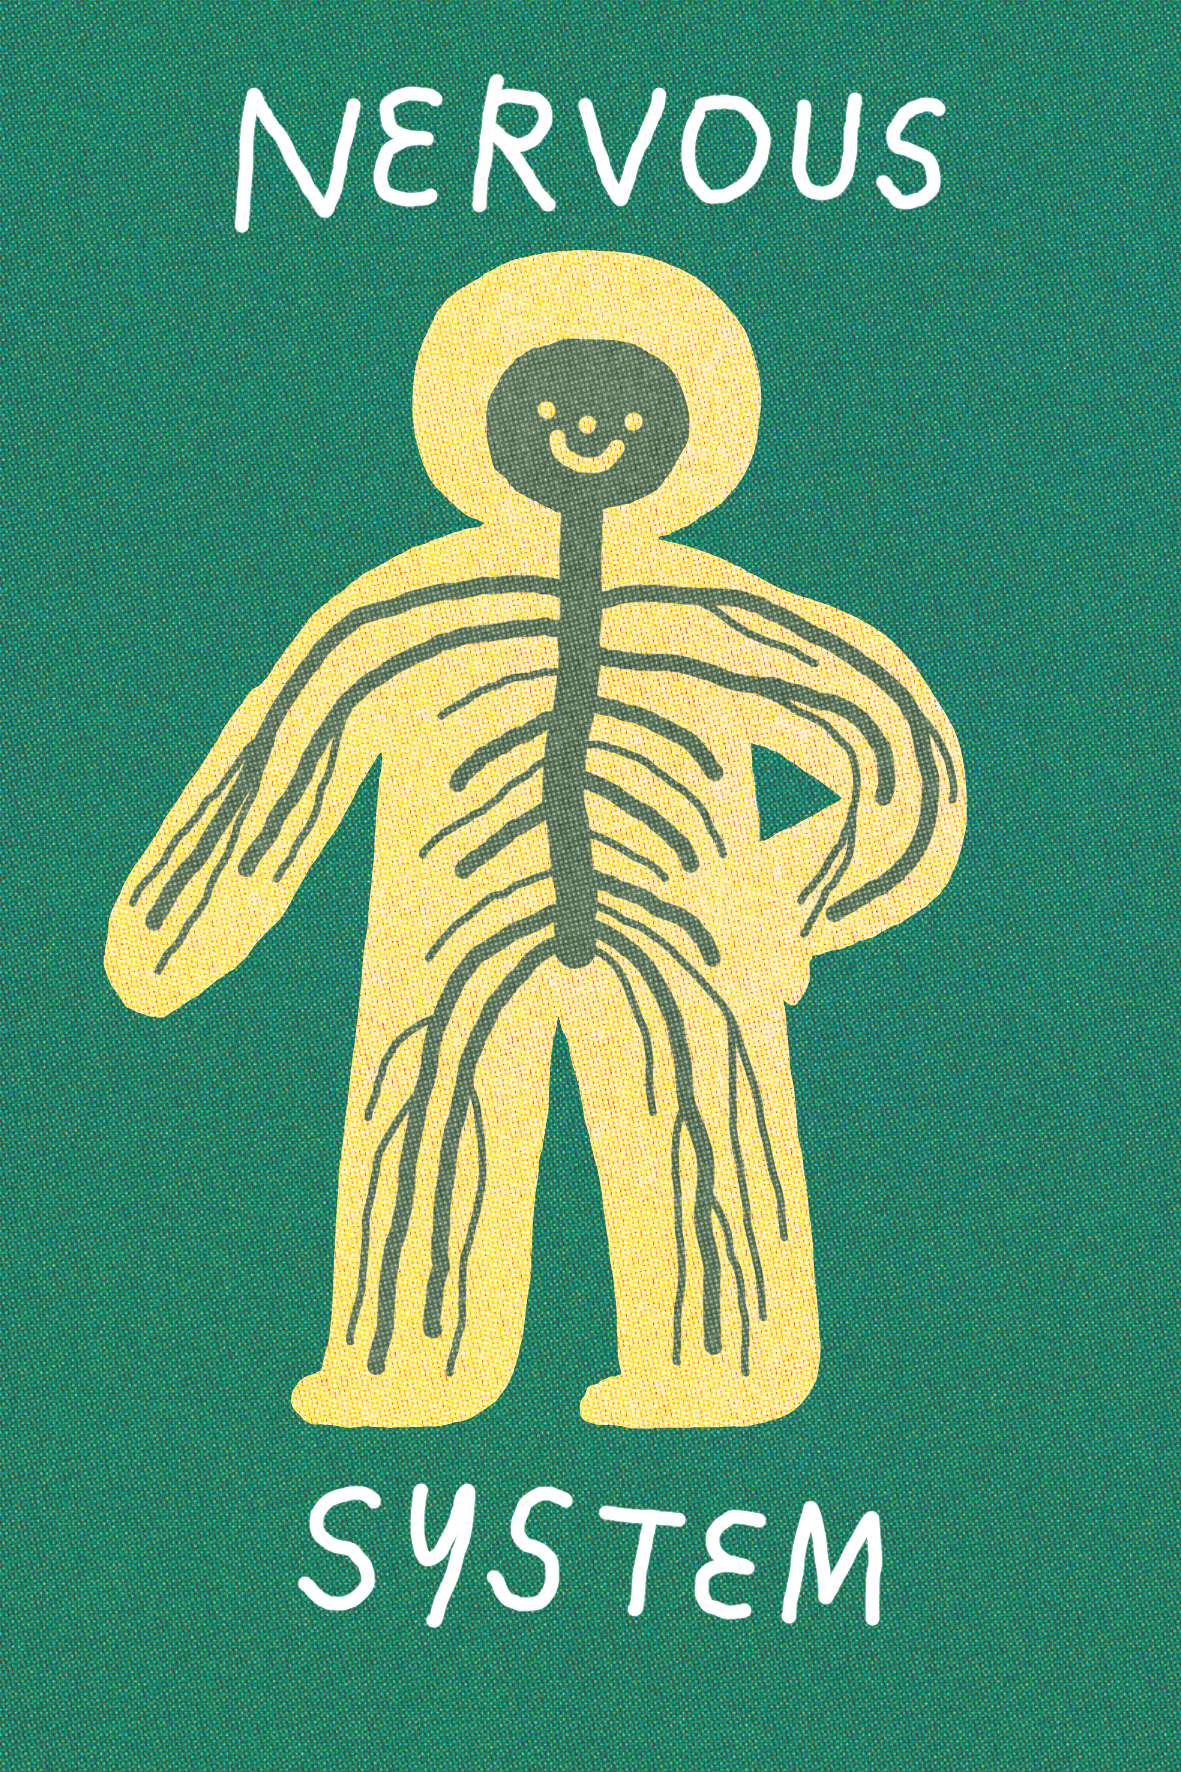 anatomy book illustration Character design  children illustration design Digital Drawing Drawing  graphic design  ILLUSTRATION  medicine